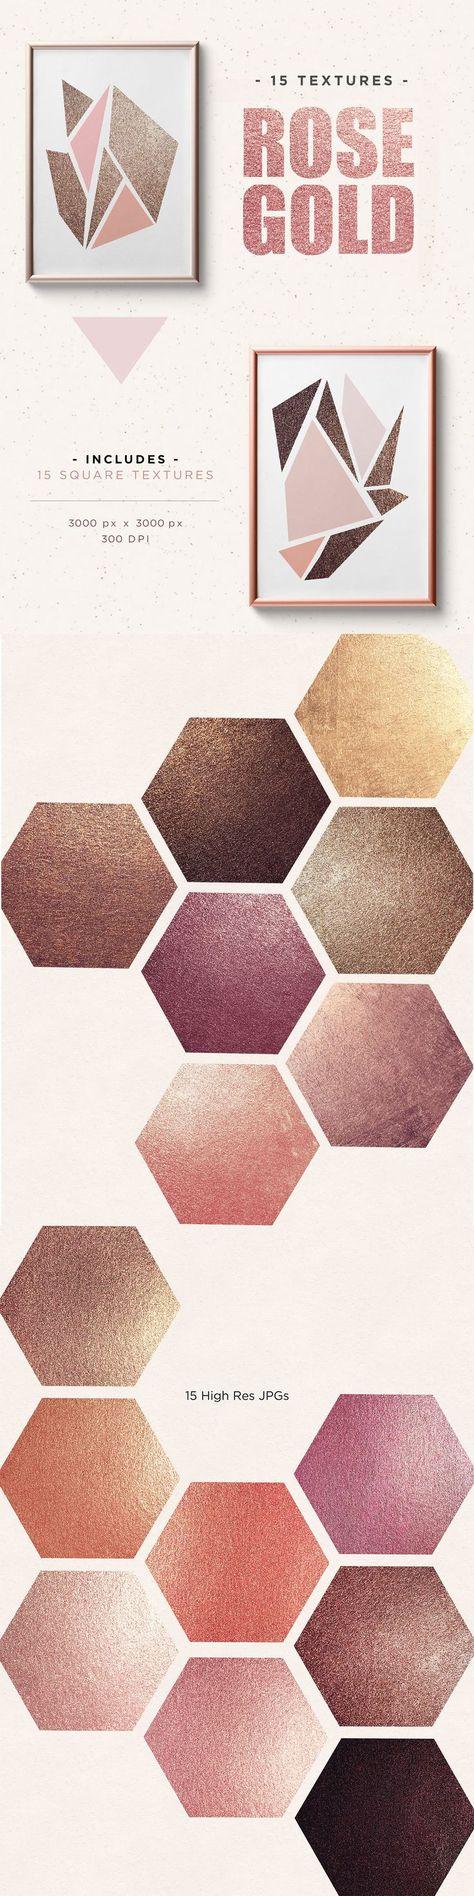 metallic 15 Rose Gold High Pigment...